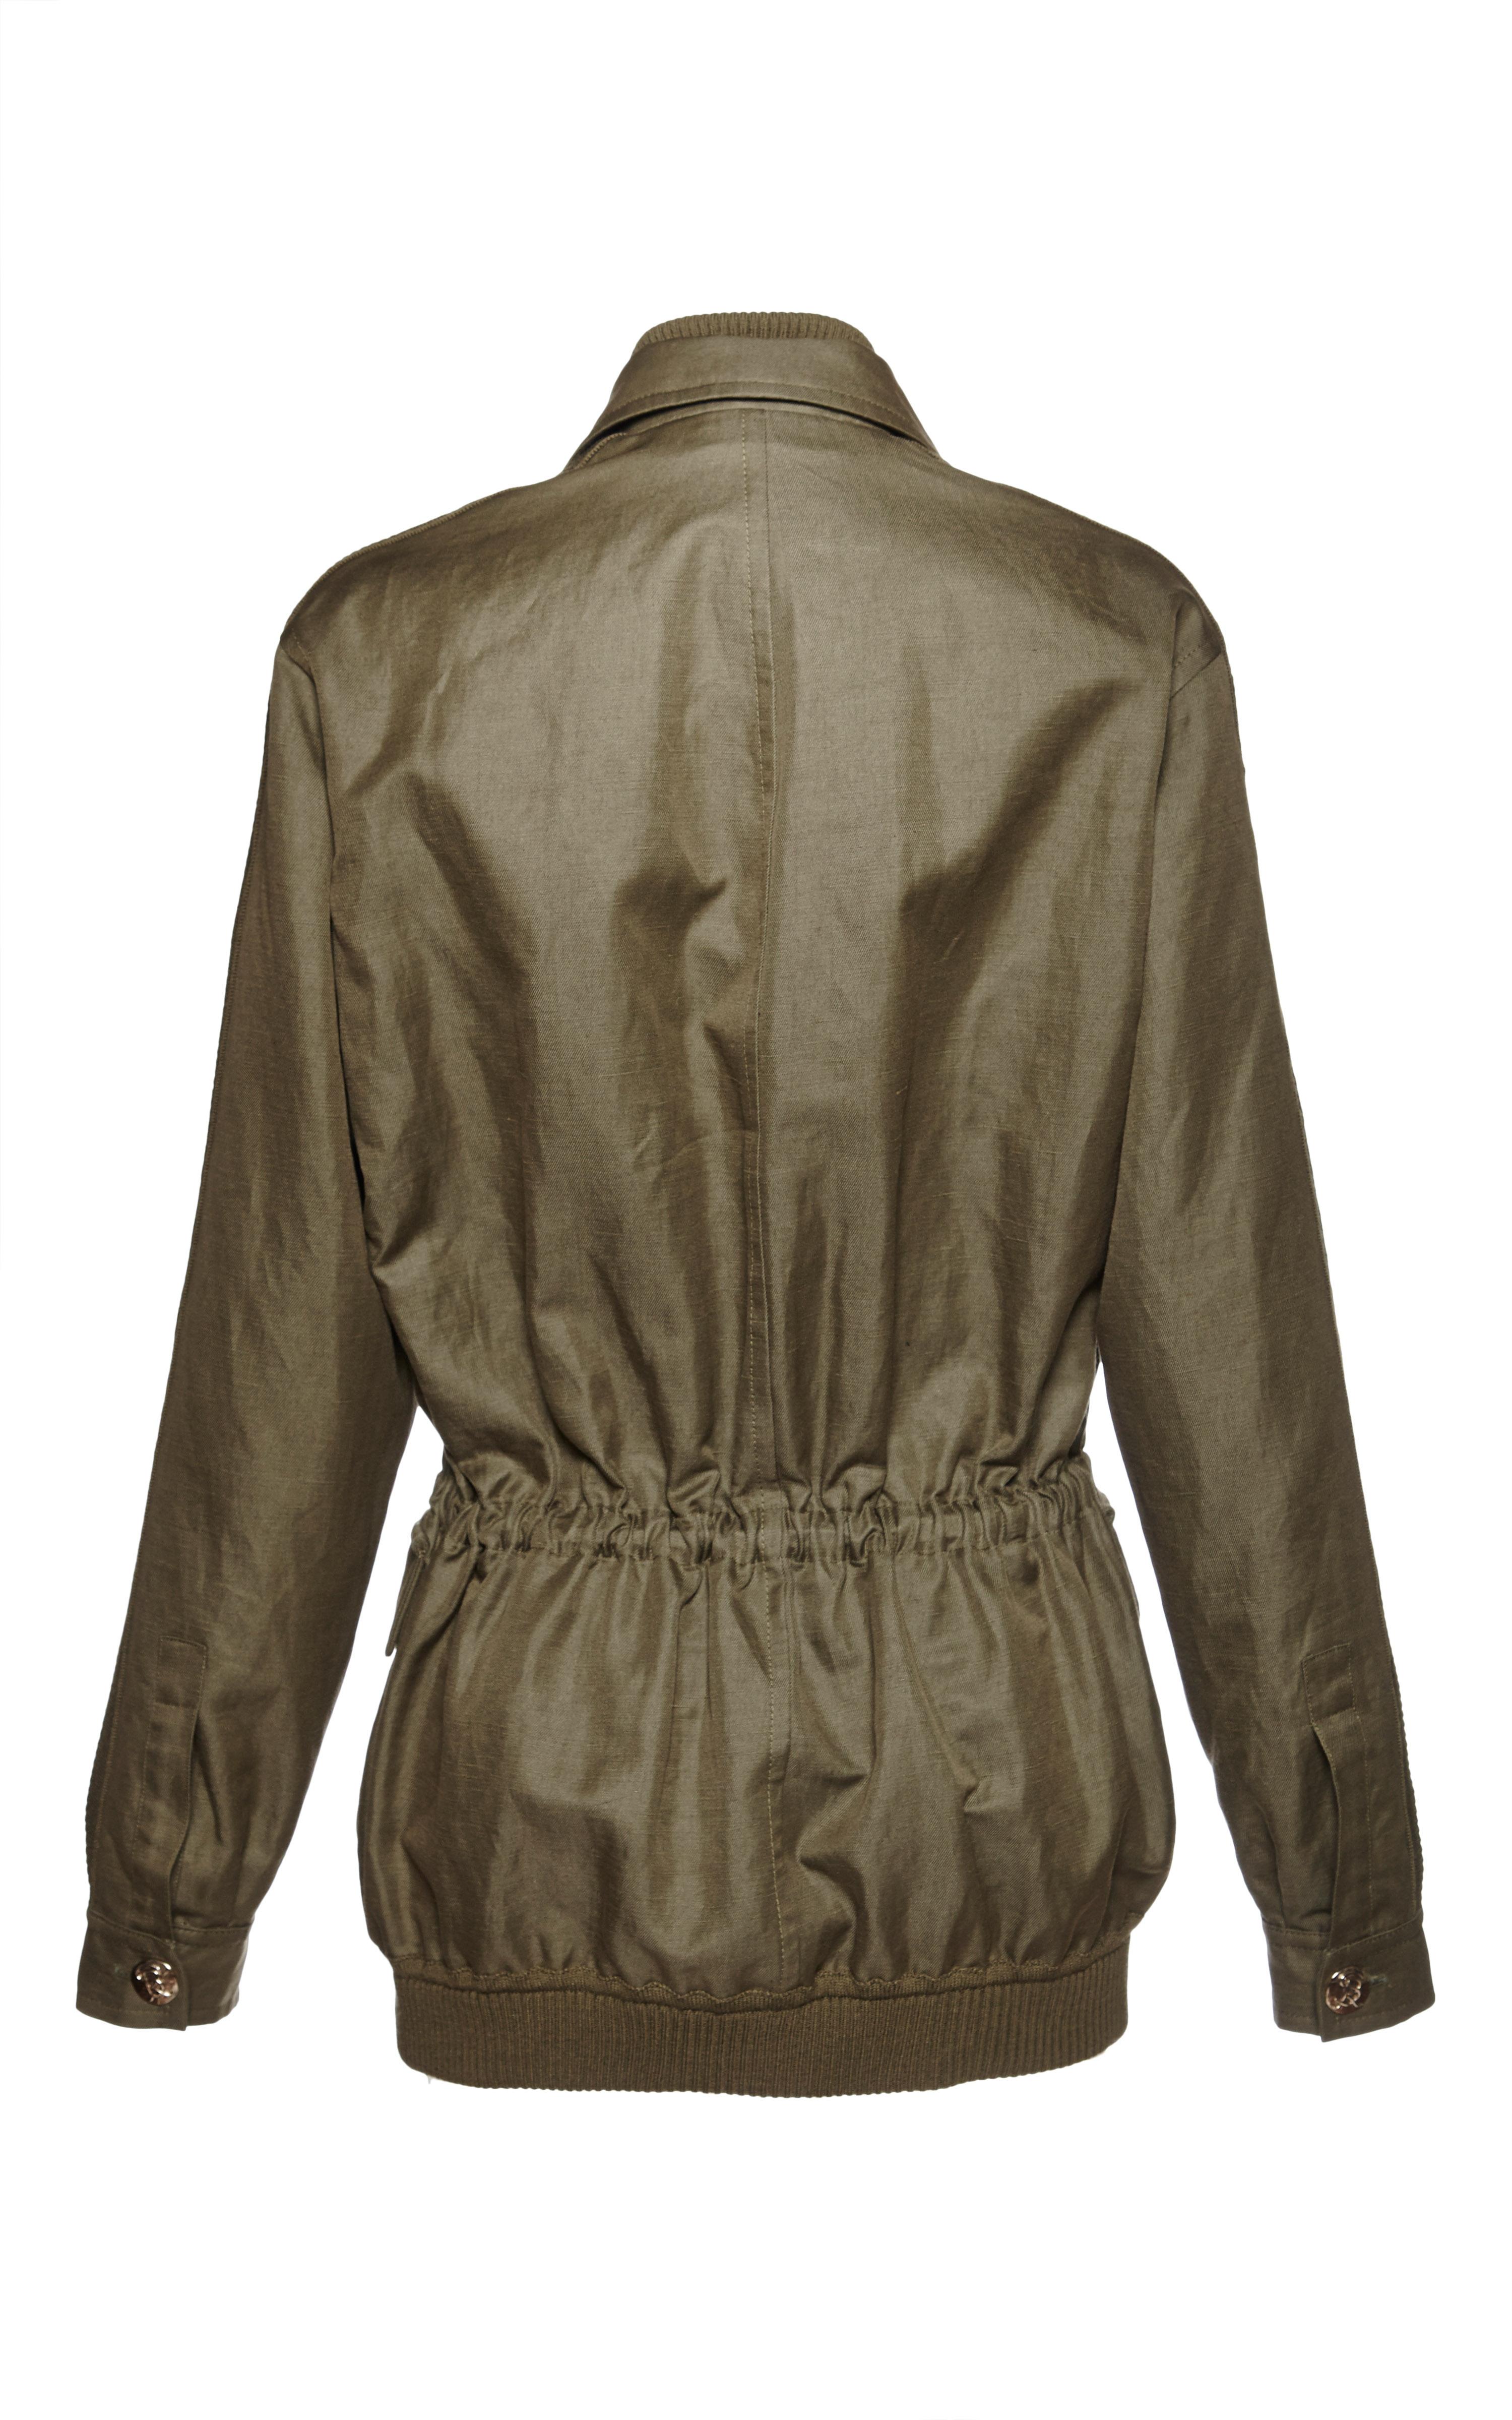 Sonia rykiel khaki cotton and linen twill embroidered